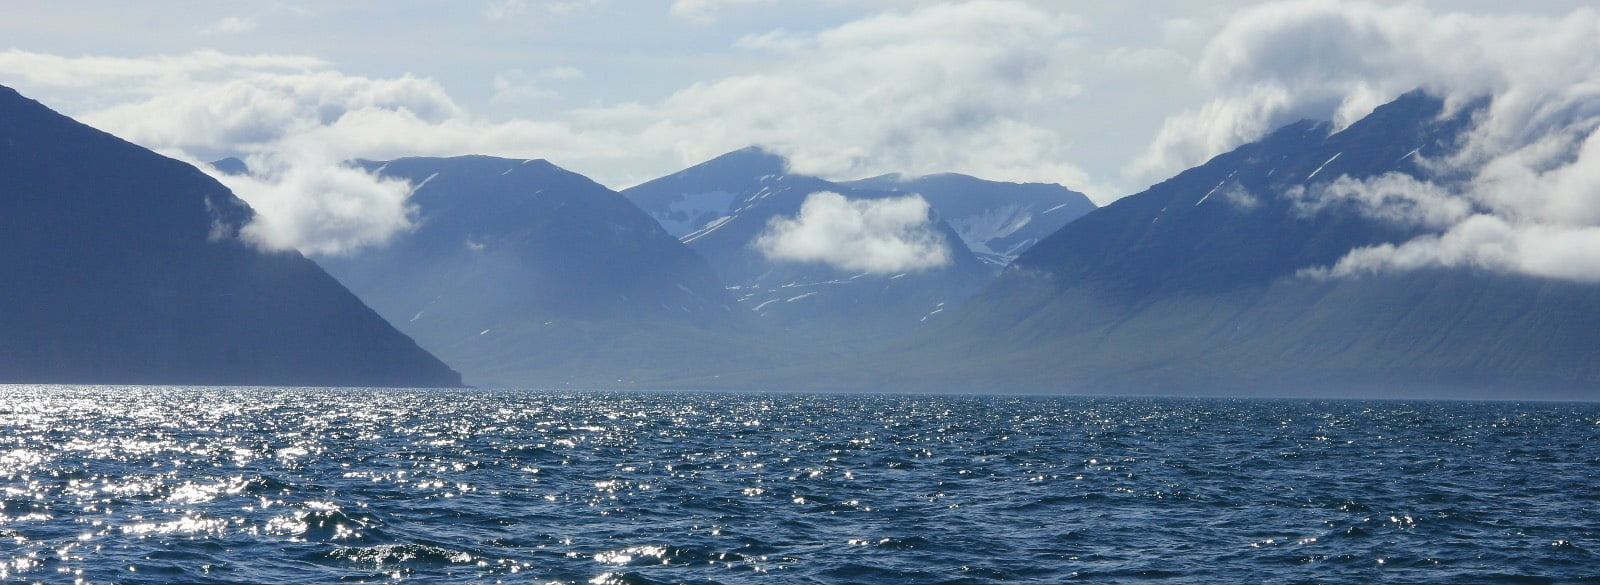 Aproaching Eyjafjordur 2